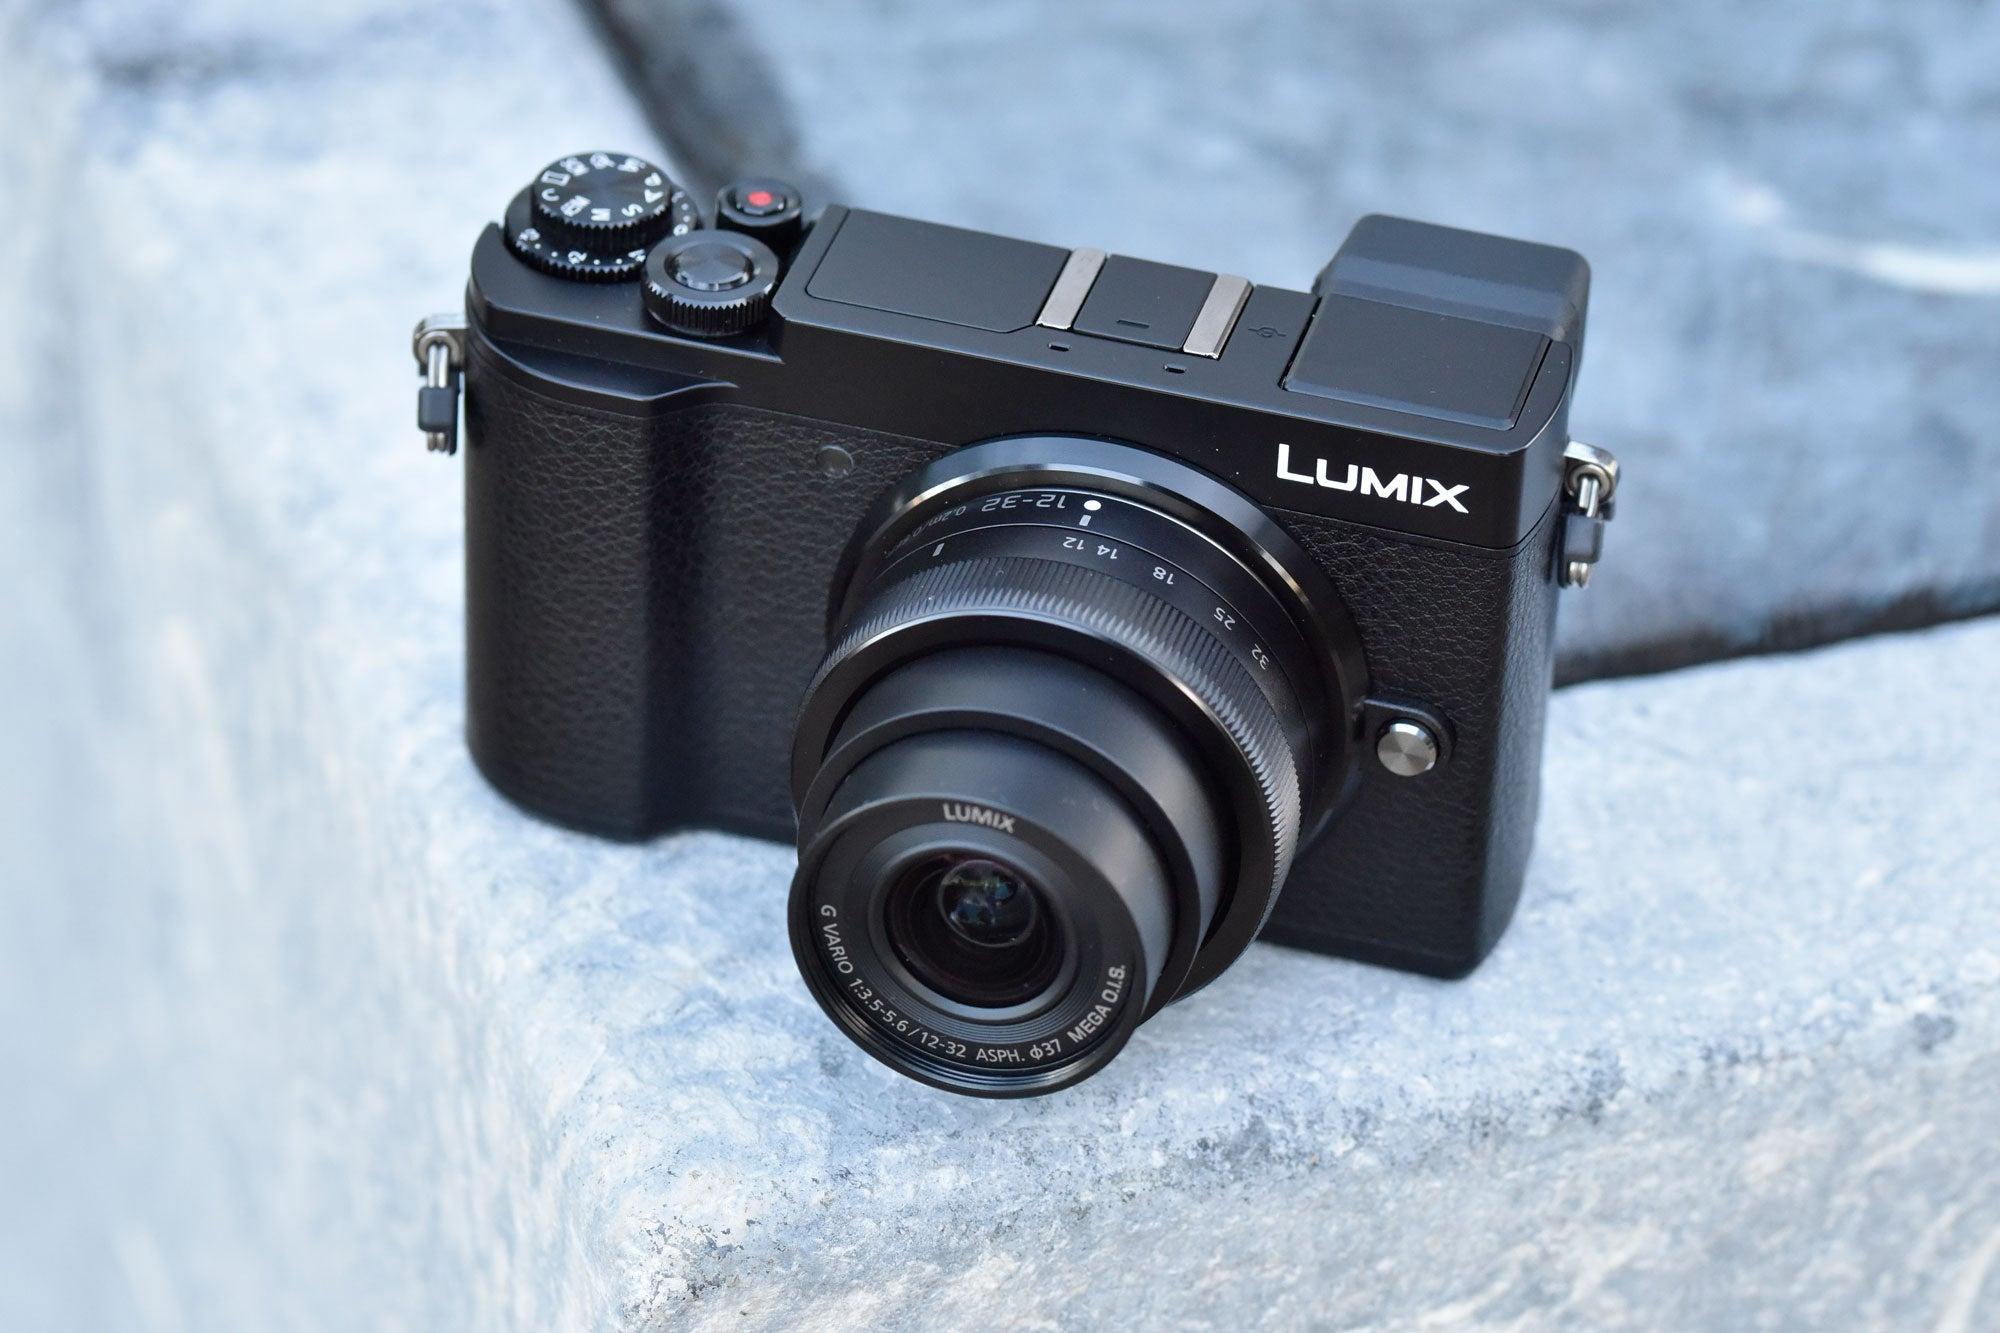 Jual Panasonic Lumix Dmc Gx85 Kit 12 32mm Silver Kamera Mirrorless Black Hitam Gx9 Review Trusted Reviews